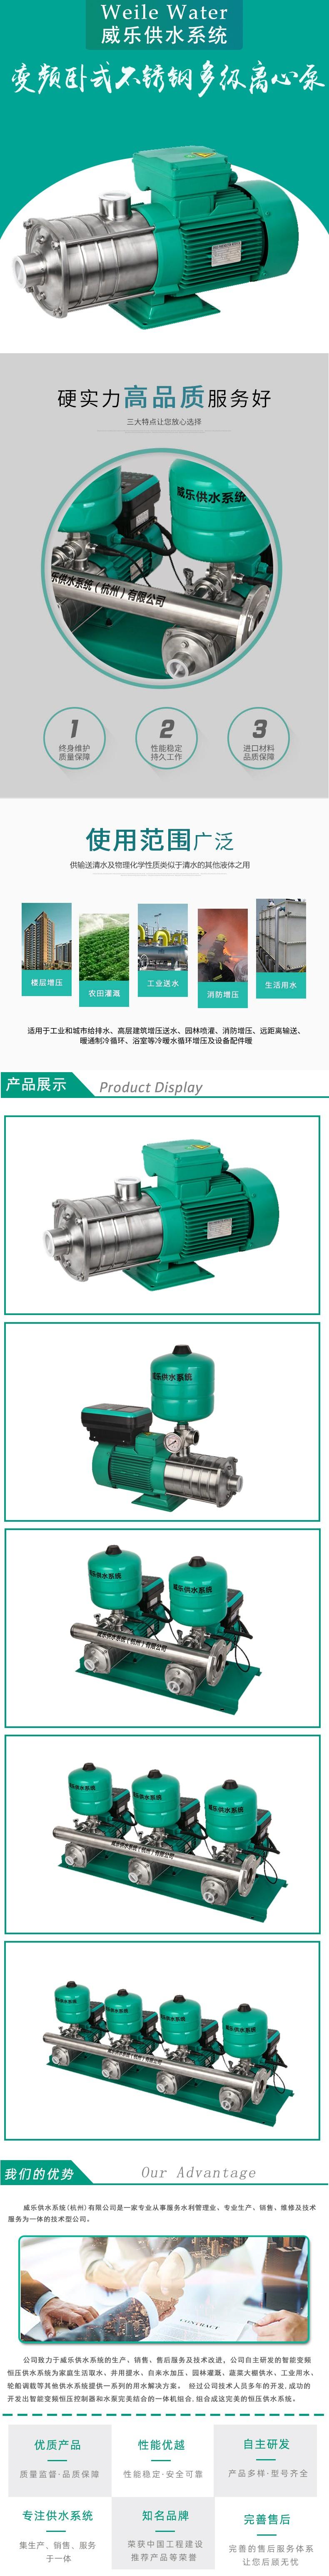 MHLBP卧式不锈钢变频泵组